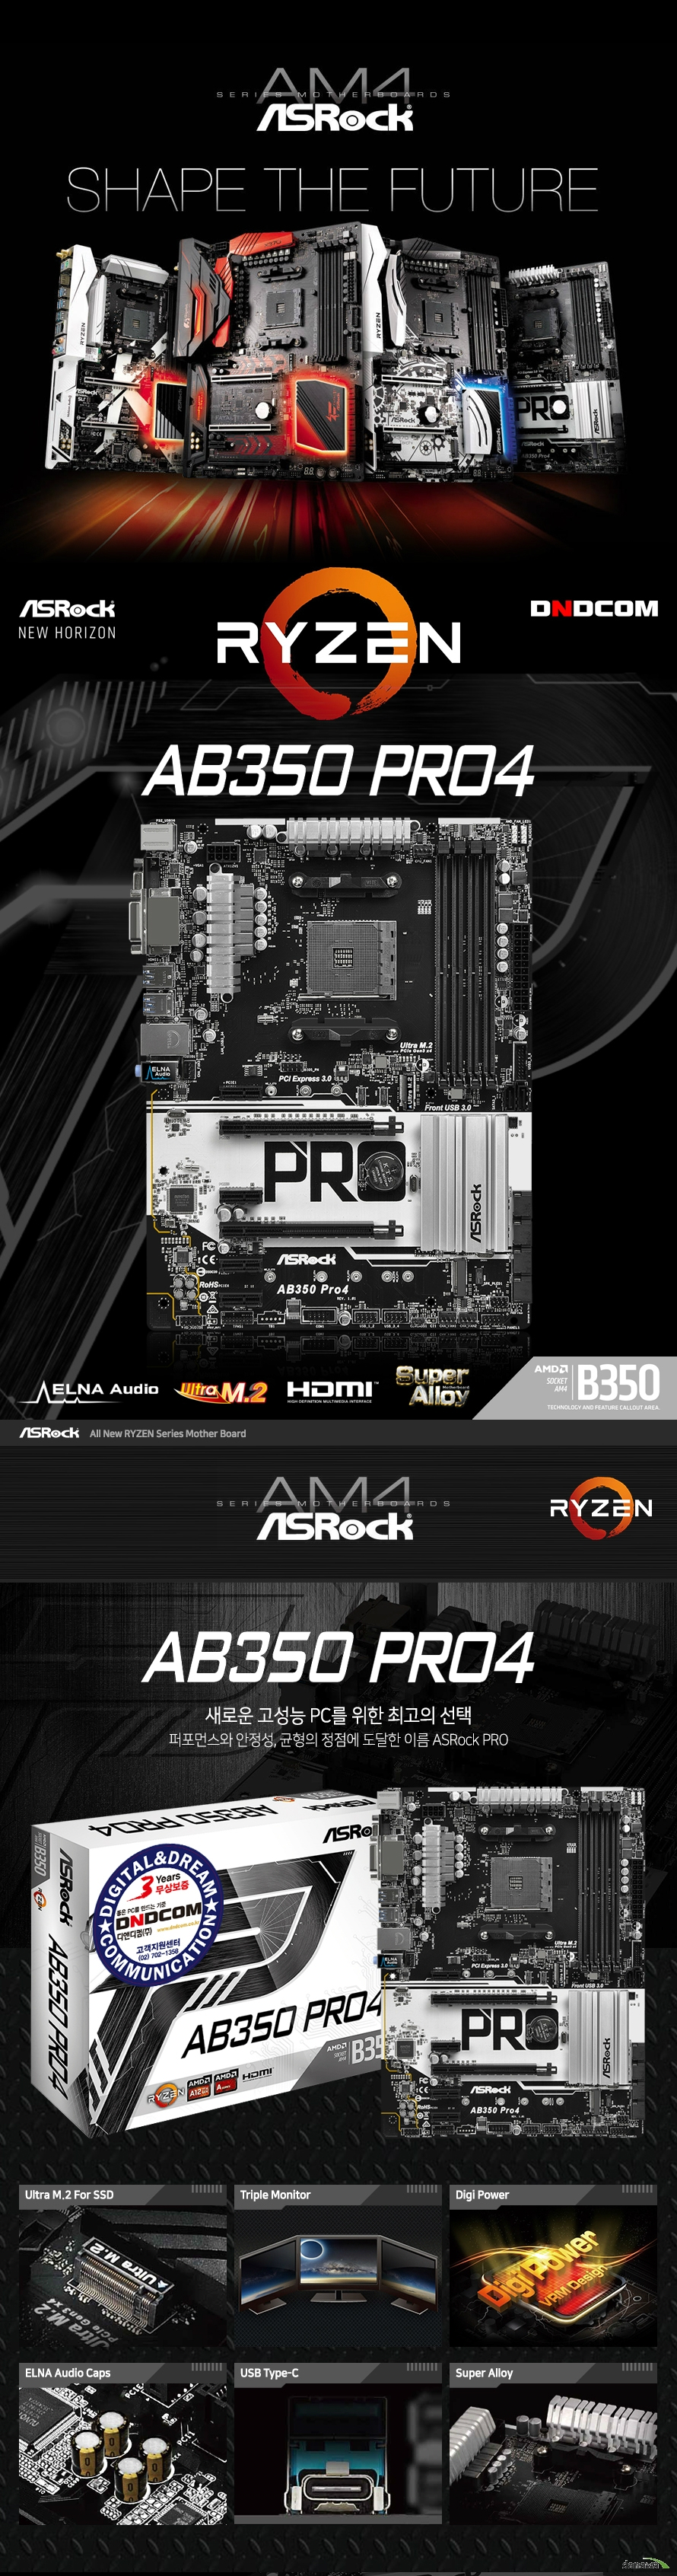 ASRock AB350 PRO4 디앤디컴  CPU 지원 AMD AM4 소켓 서밋릿지 라이젠 시리즈 CPU 지원 DIGI파워 디자인 95와트 에어 쿨링 지원  AMD B350칩셋  듀얼 채널 DDR 4 메모리 슬롯 4개 최대 64기가바이트 지원 DDR4 3200 2933 2667 2400 2133 ecc & non ecc 언 버퍼드 메모리 지원  AMD 라데온 R7 R5 시리즈 그래픽스 내장 그래픽 지원 다이렉트 X 12 및 픽셀 쉐이더 5.0 지원 최대 3대 멀티 디스플레이 지원  16배속 동작 PCI익스프레스 3.0 16배속 슬롯 1개 지원  4배속 동작 PCI익스프레스 3.0 16배속 슬롯 1개 지원 PCI익스프레스 2.0 1배속 슬롯 4개 지원  SATA3 포트 6개 지원 2242 2260 2280규격 울트라 M.2 소켓 1개 지원 2230 2242 2260 2280 22110규격 M.2 소켓 1개 지원  USB 3.1 GEN1 TYPE C 포트 백패널 1개 지원 USB 3.1 GEN1 TYPE A 포트 백패널 5개 및 전면 2개 총 7개 지원 USB2.0 백패널 2개 및 전면 4개 총 6개 포트 지원  리얼텍 RTL8111GR 기가비트 랜 지원  윈도우 10 64비트 운영체제 지원  ATX 폼팩터 길이 30.5센티미터 넓이 22.4센티미너 KC 인증번호 MSIP REM ASR AB350PRO4